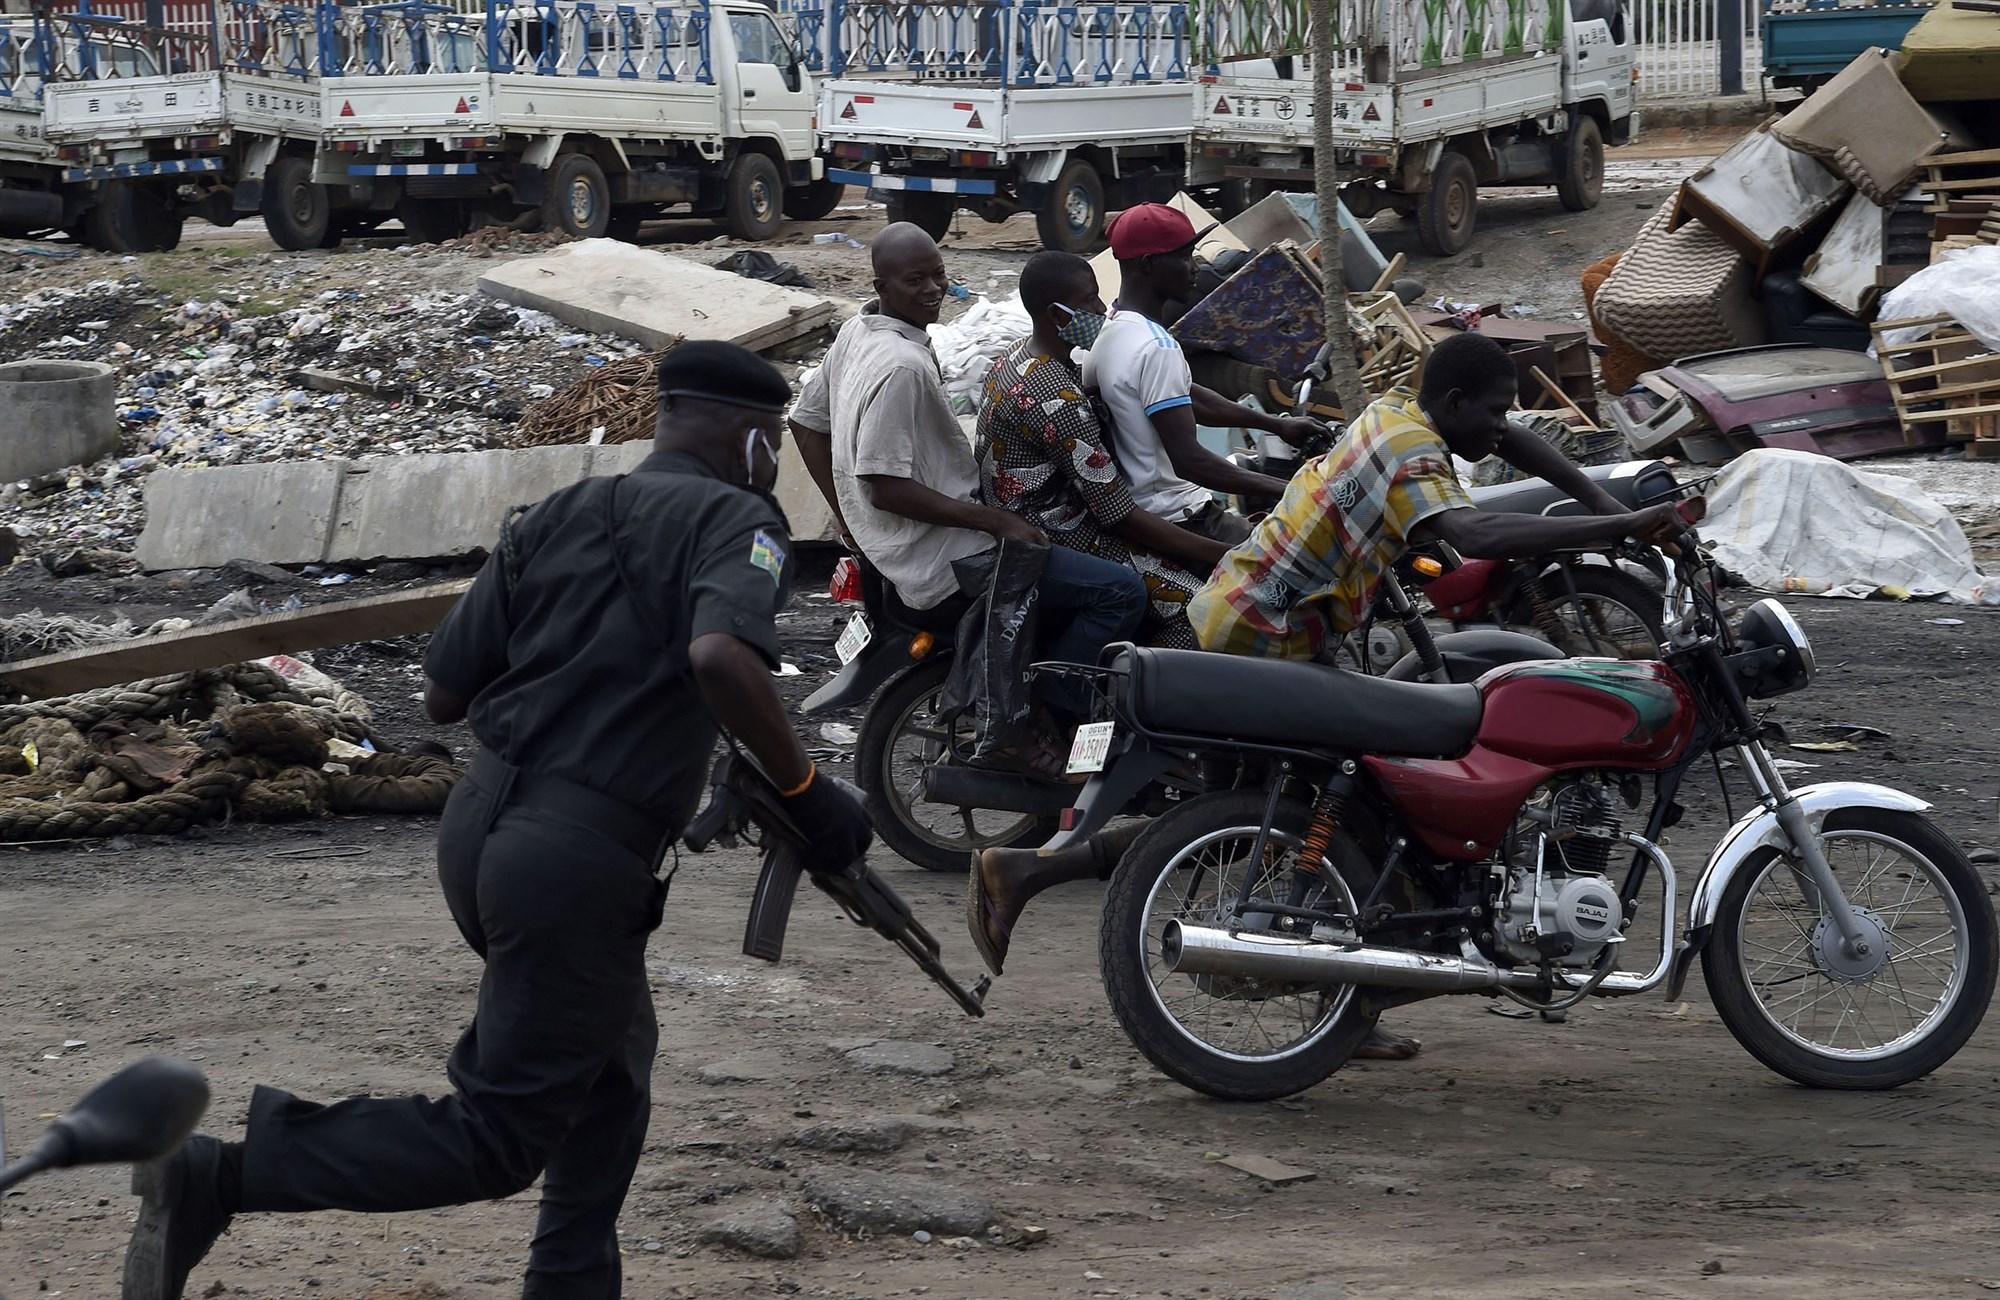 nigerianspushtoendpolicebrutalityafterglobalgeorgefloydprotests